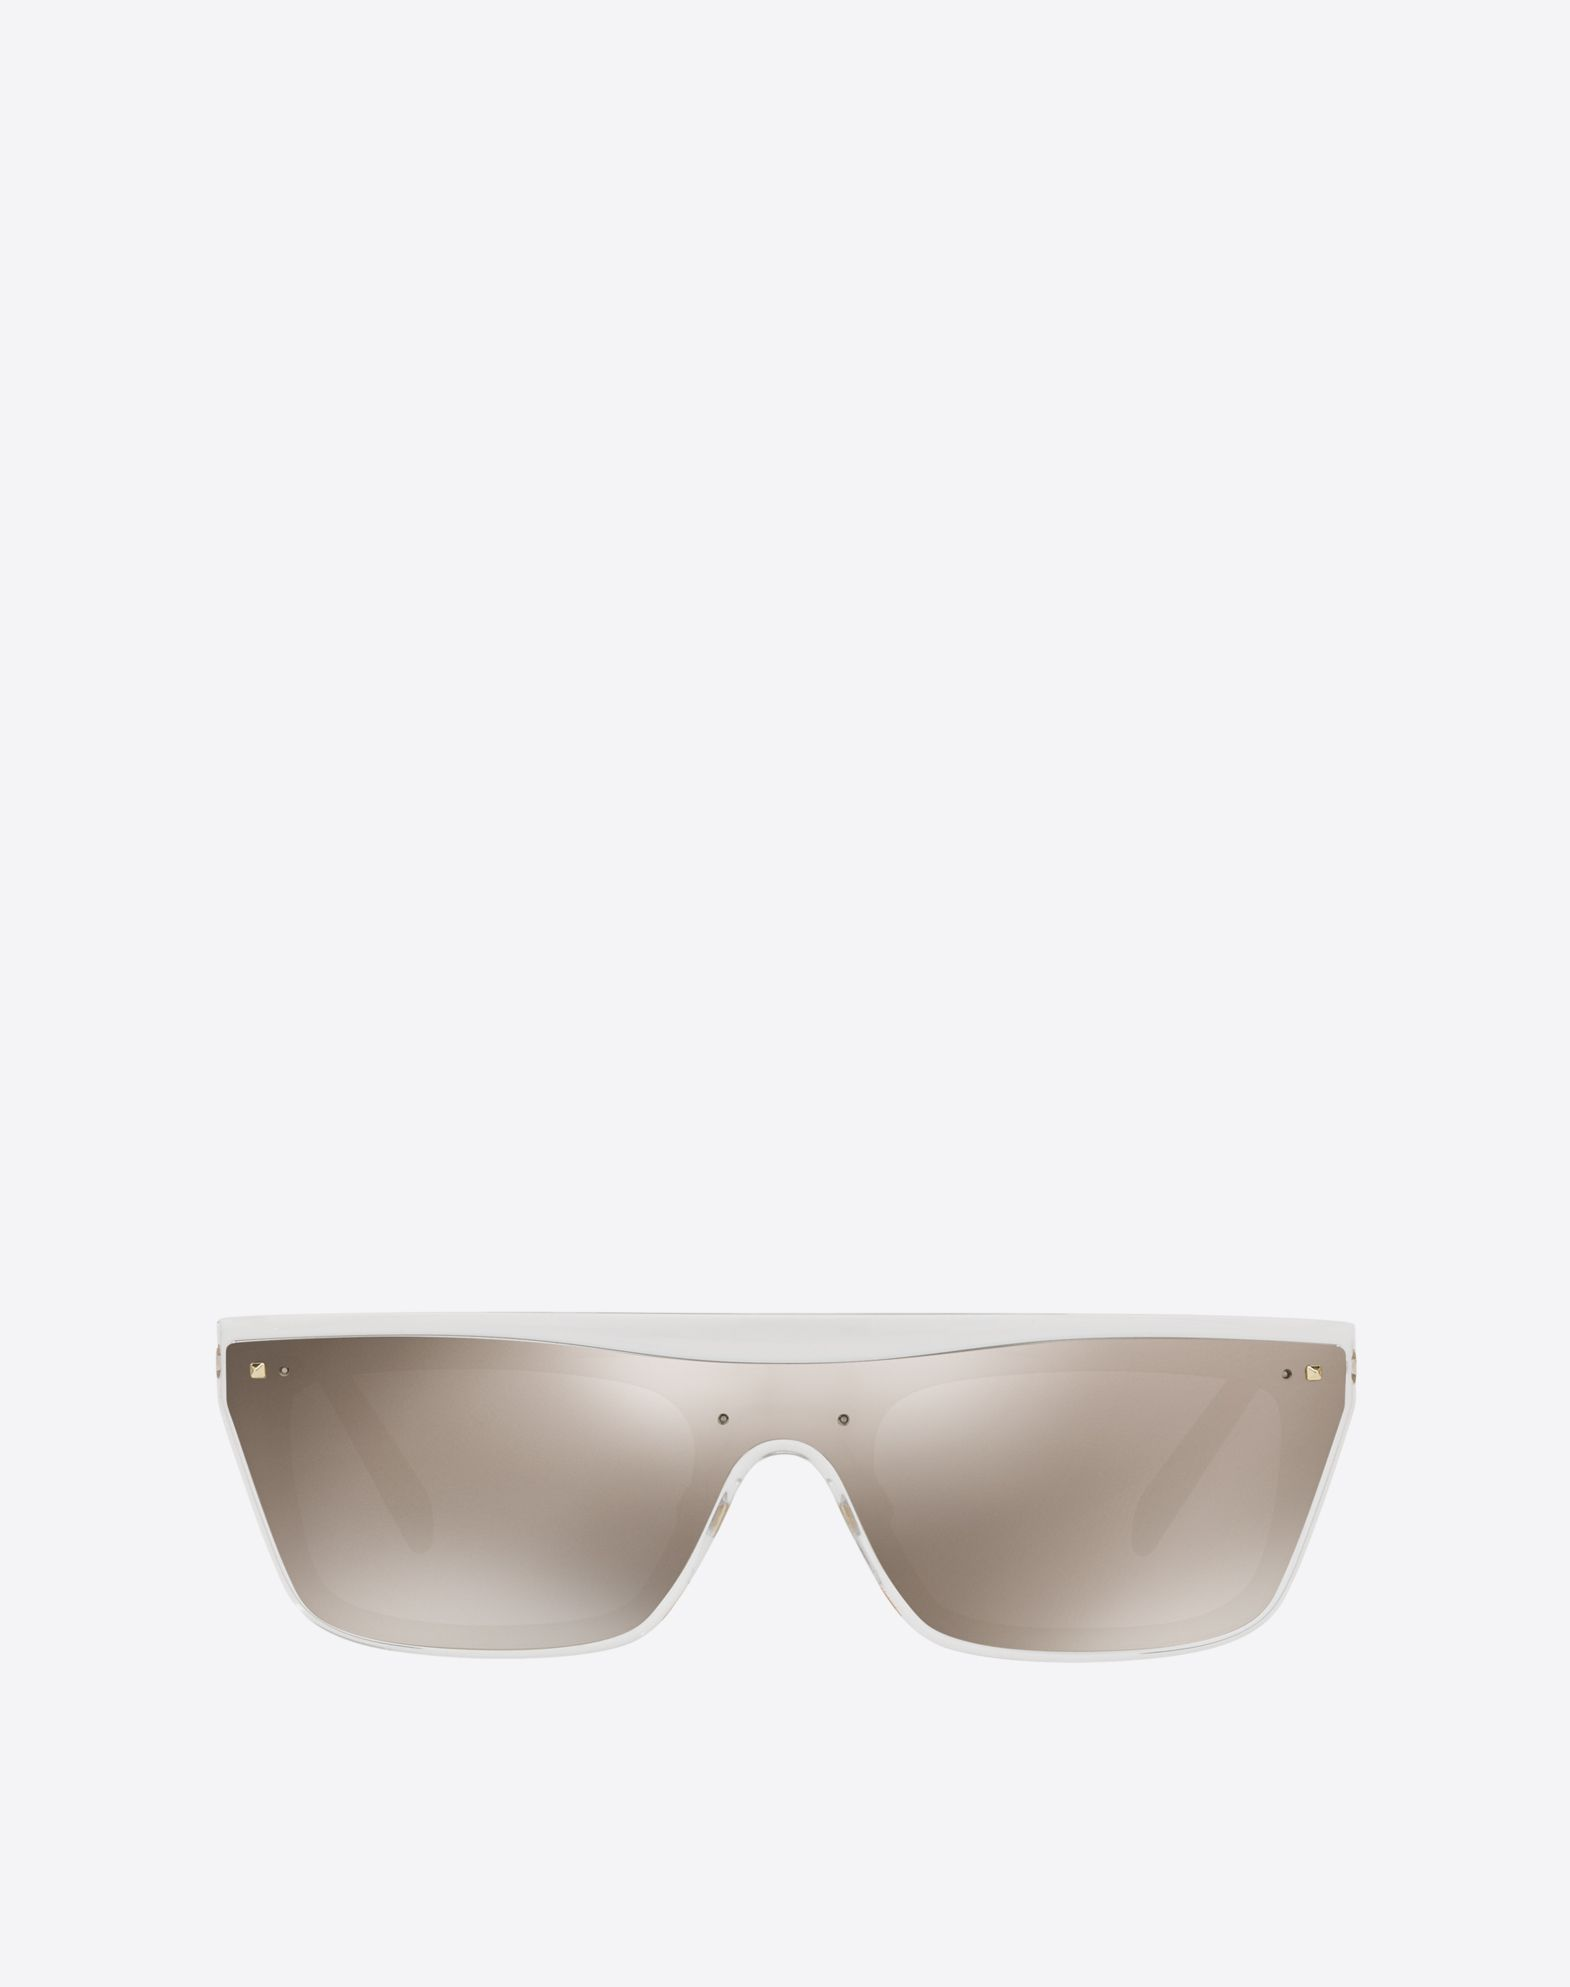 VALENTINO Logo Reflective lenses  46508030cl